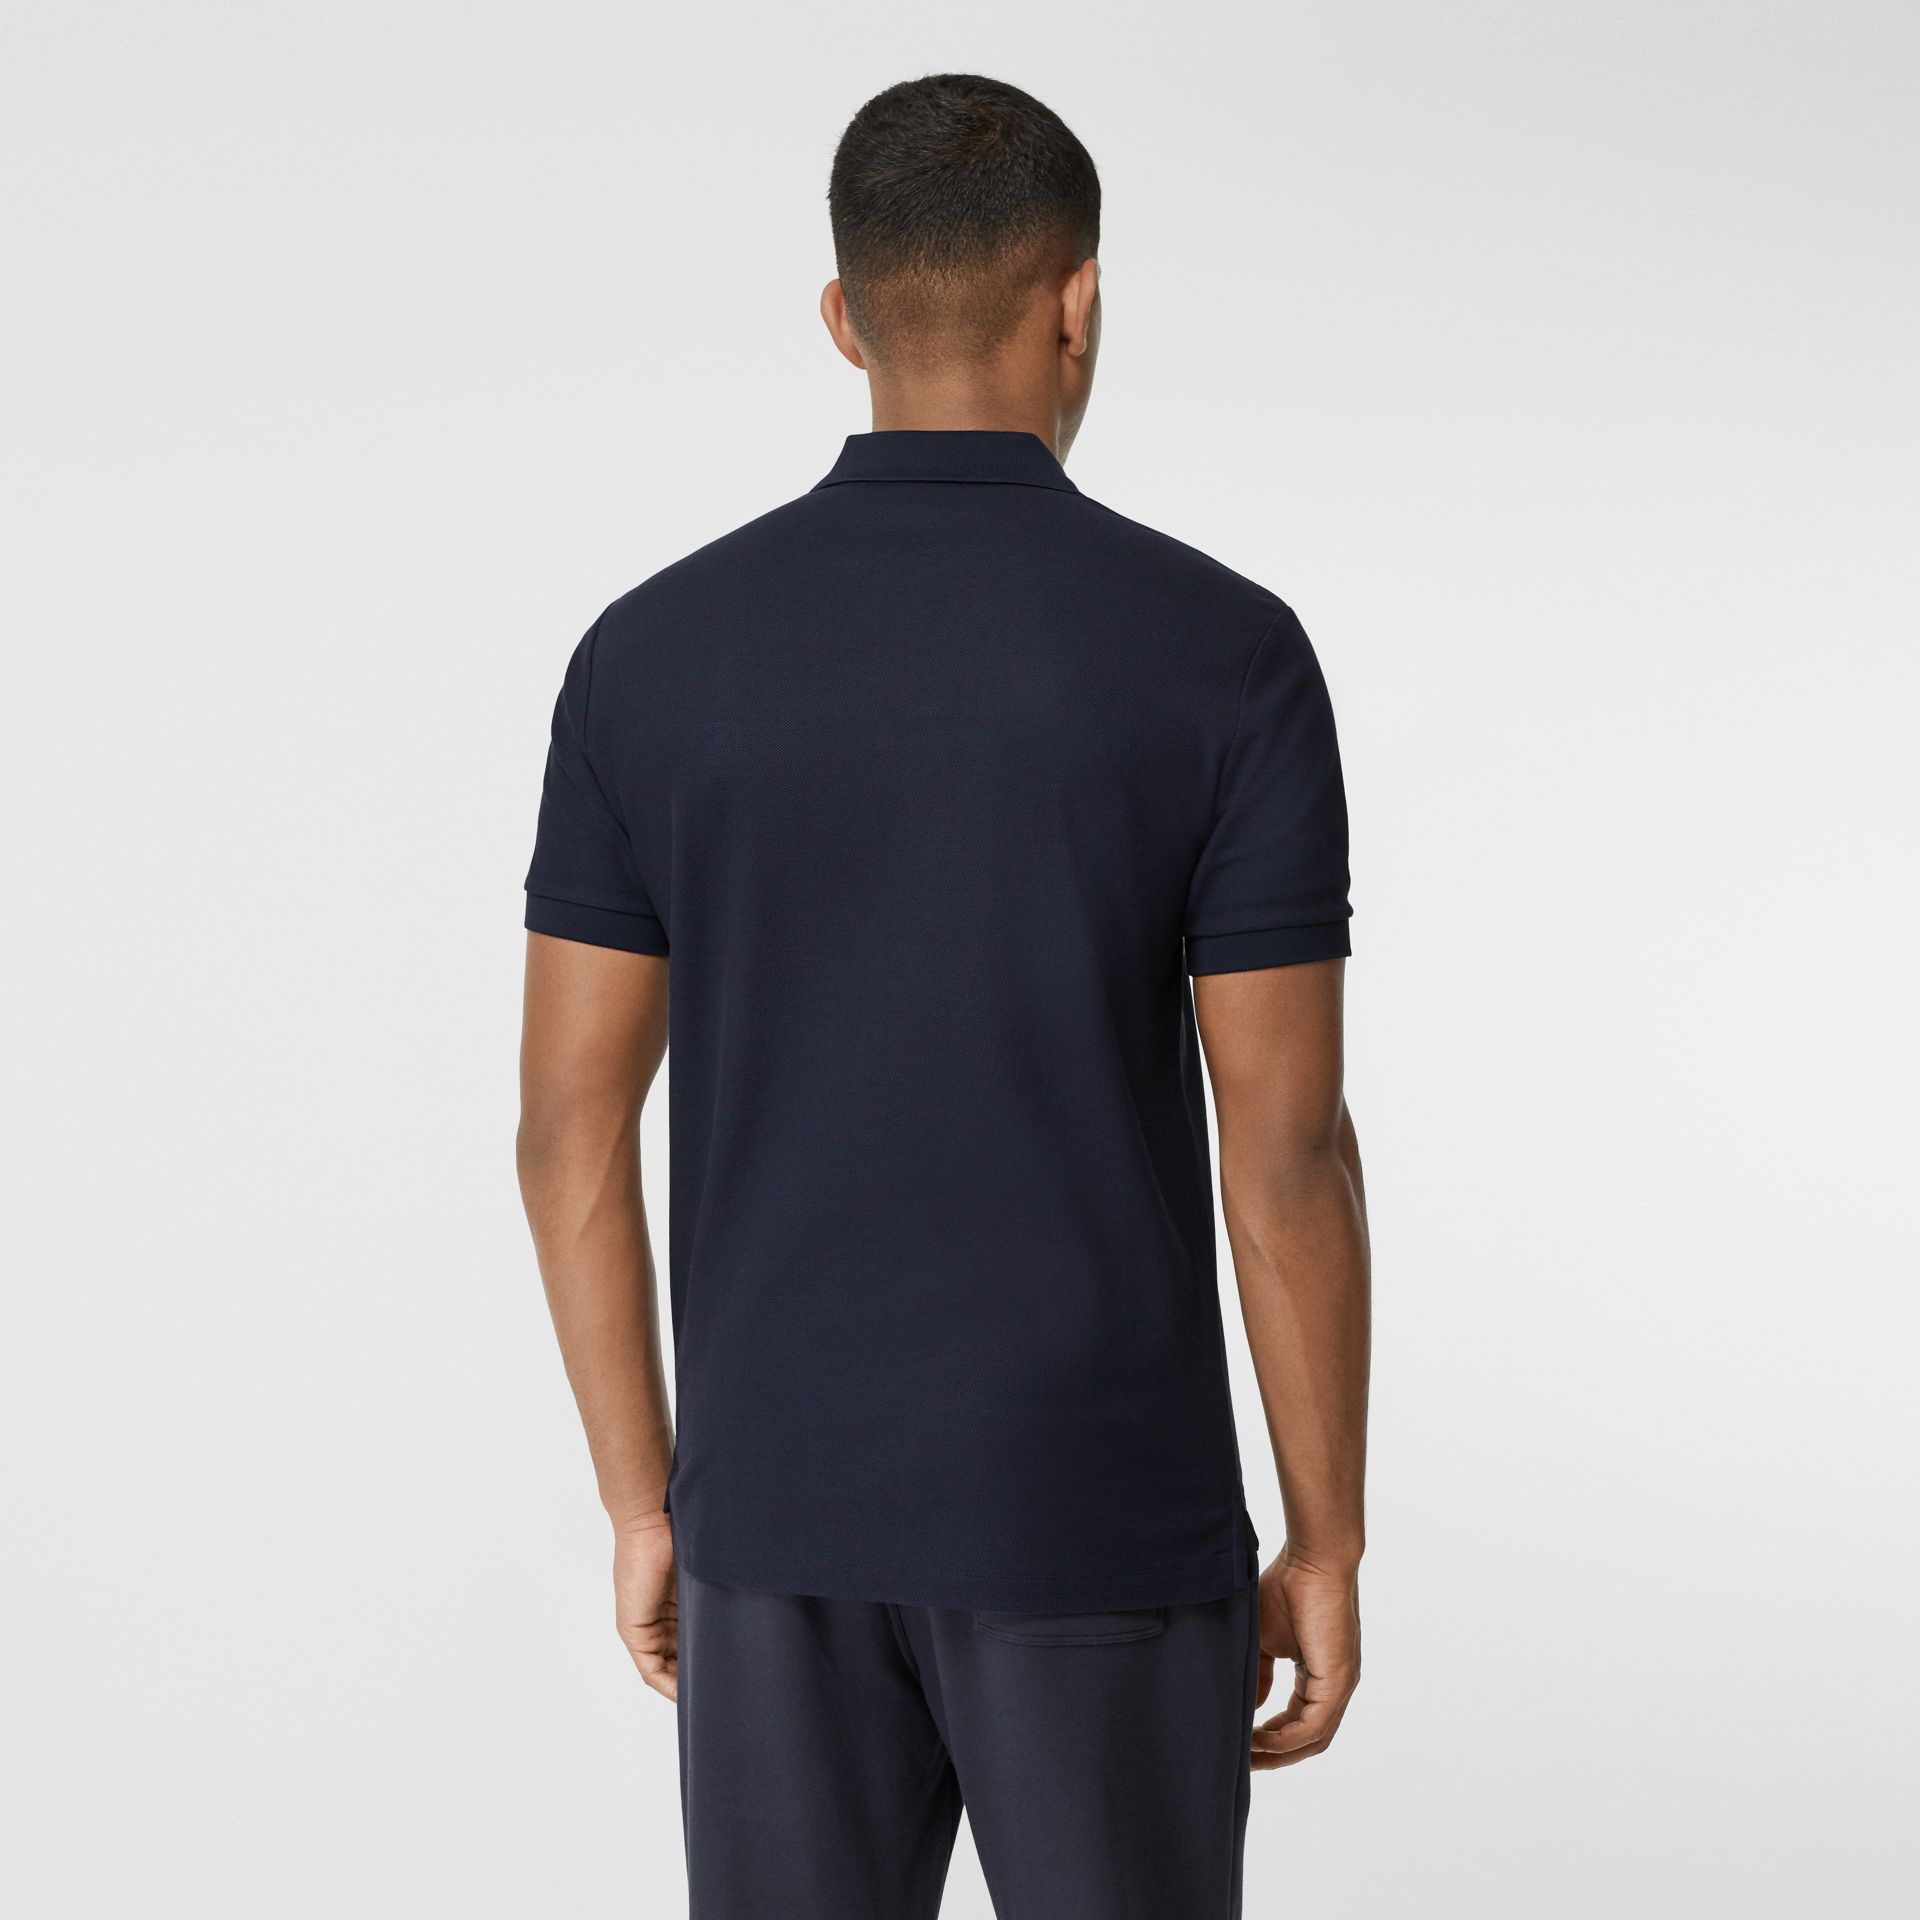 Contrast Logo Graphic Cotton Piqué Polo Shirt in Navy - Men | Burberry - gallery image 2